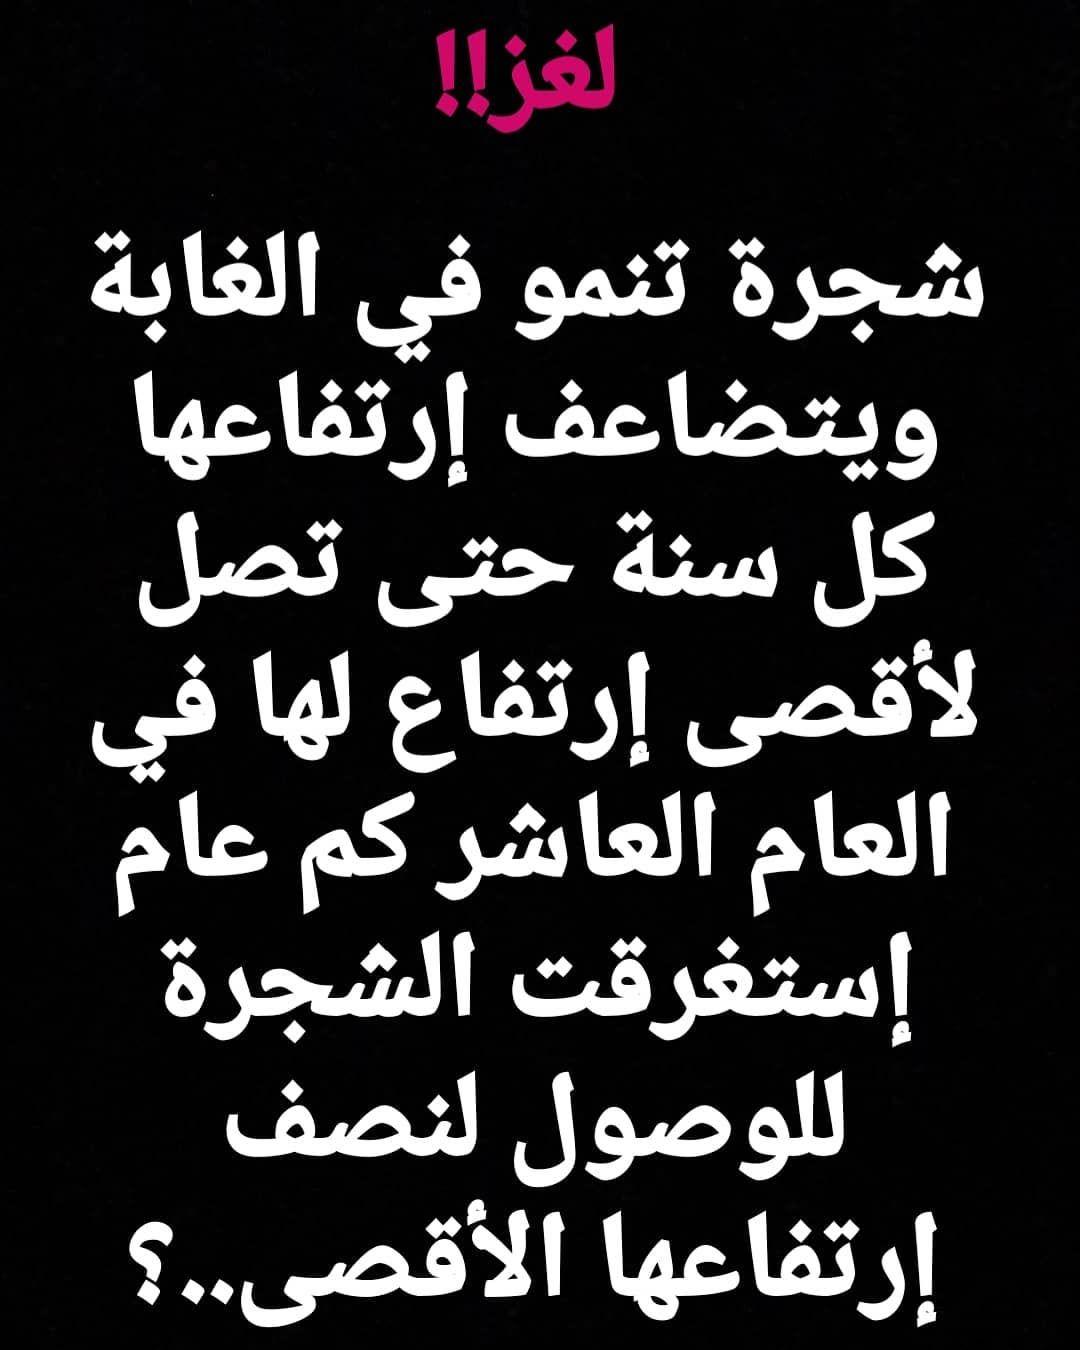 Pin By قصص قبل النوم On ألغاز Arabic Calligraphy Calligraphy